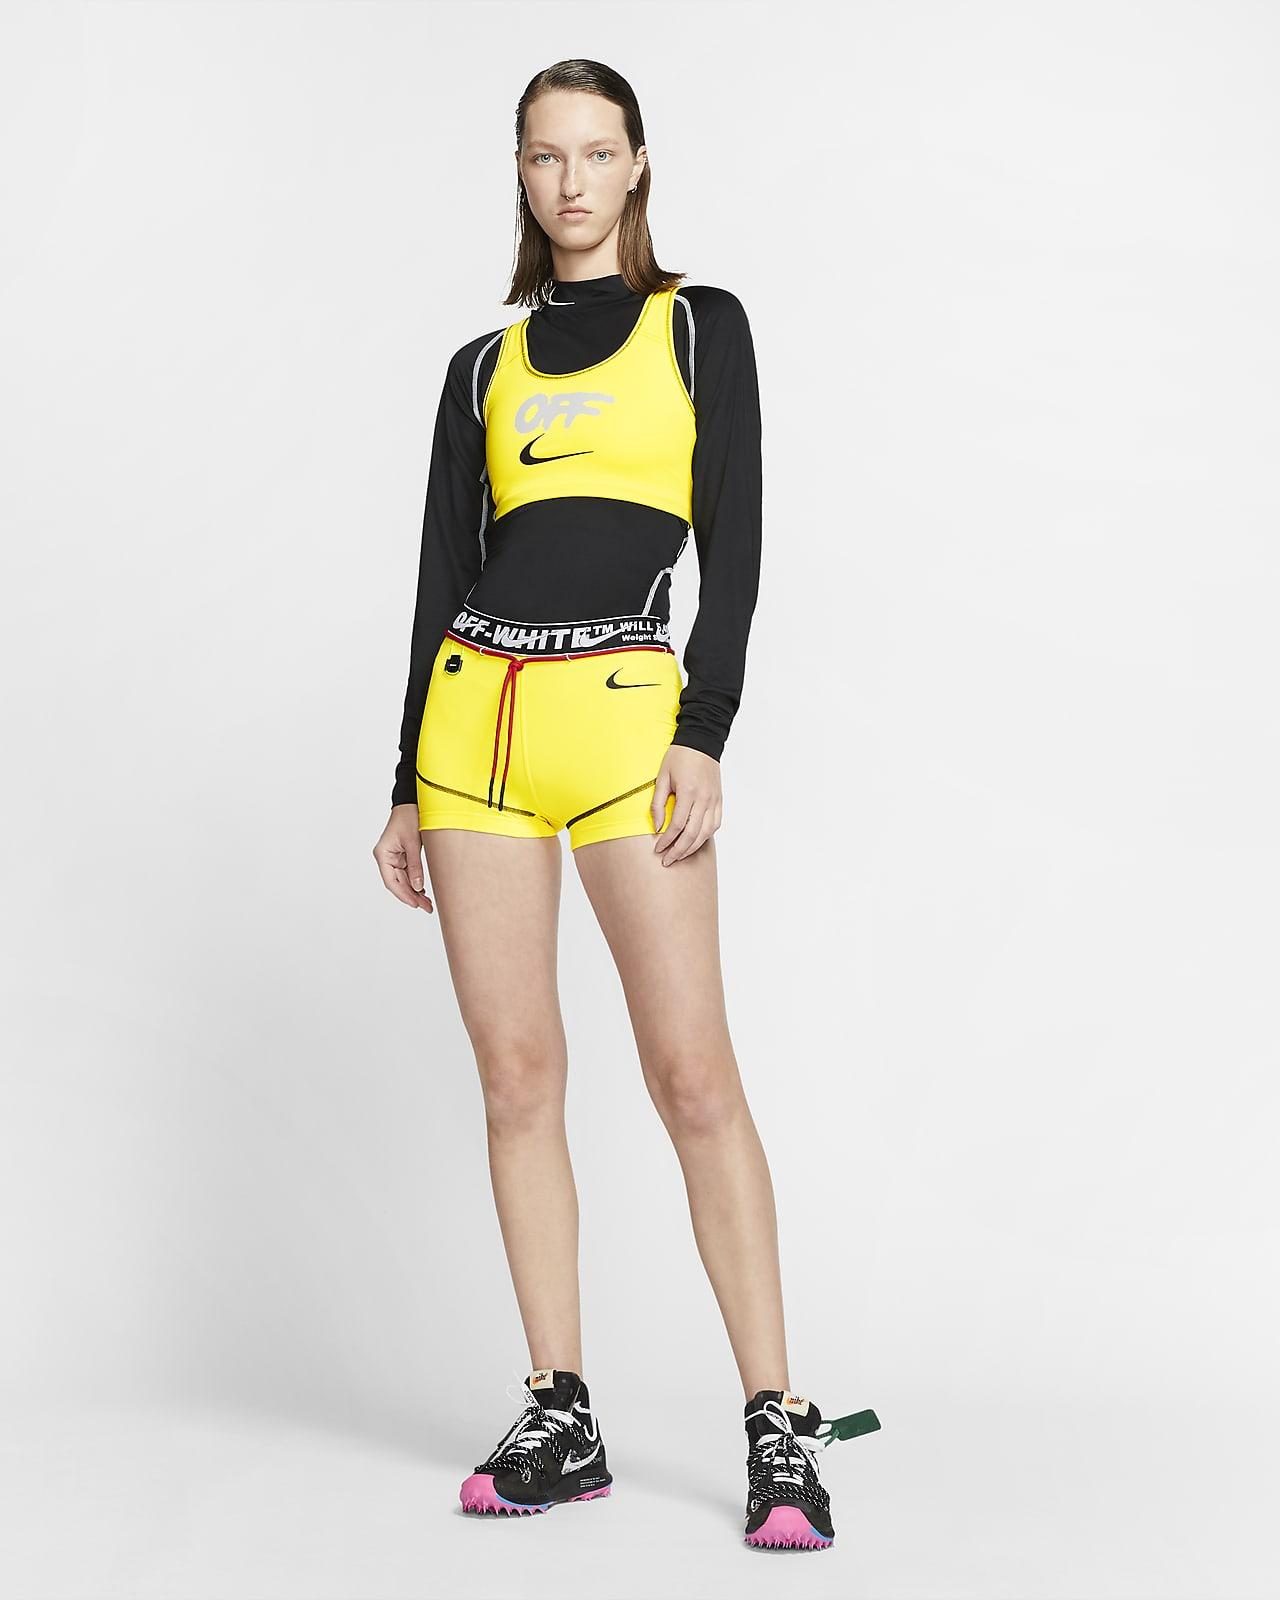 Nike x Off-White™ Women's Shorts. Nike ID